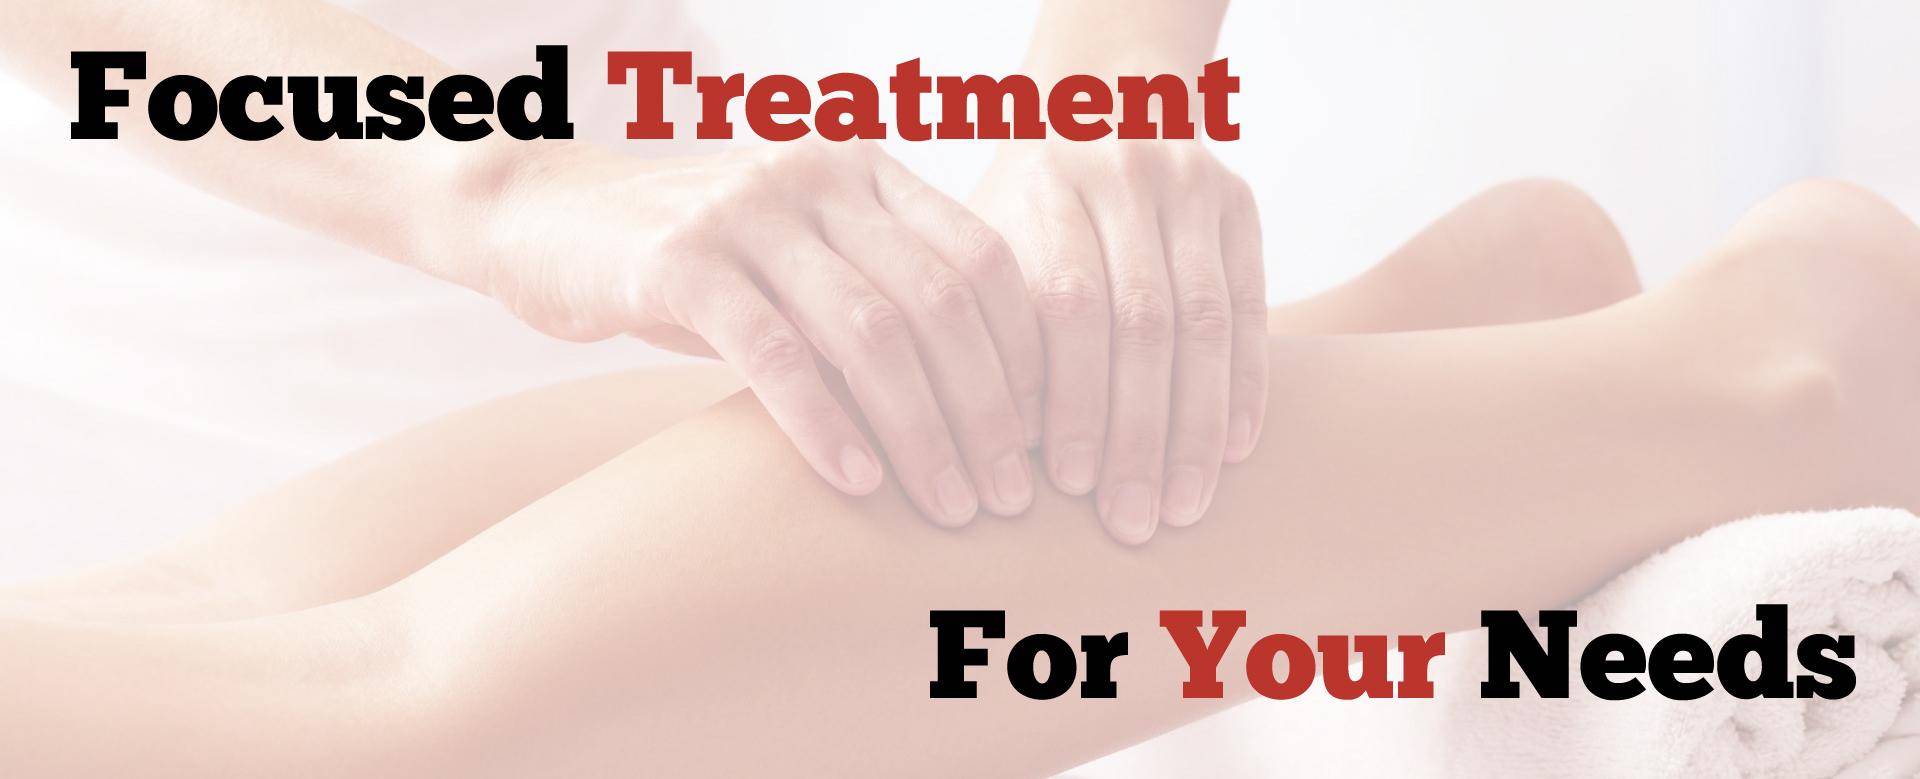 Exeter Massage - Focused Treatment